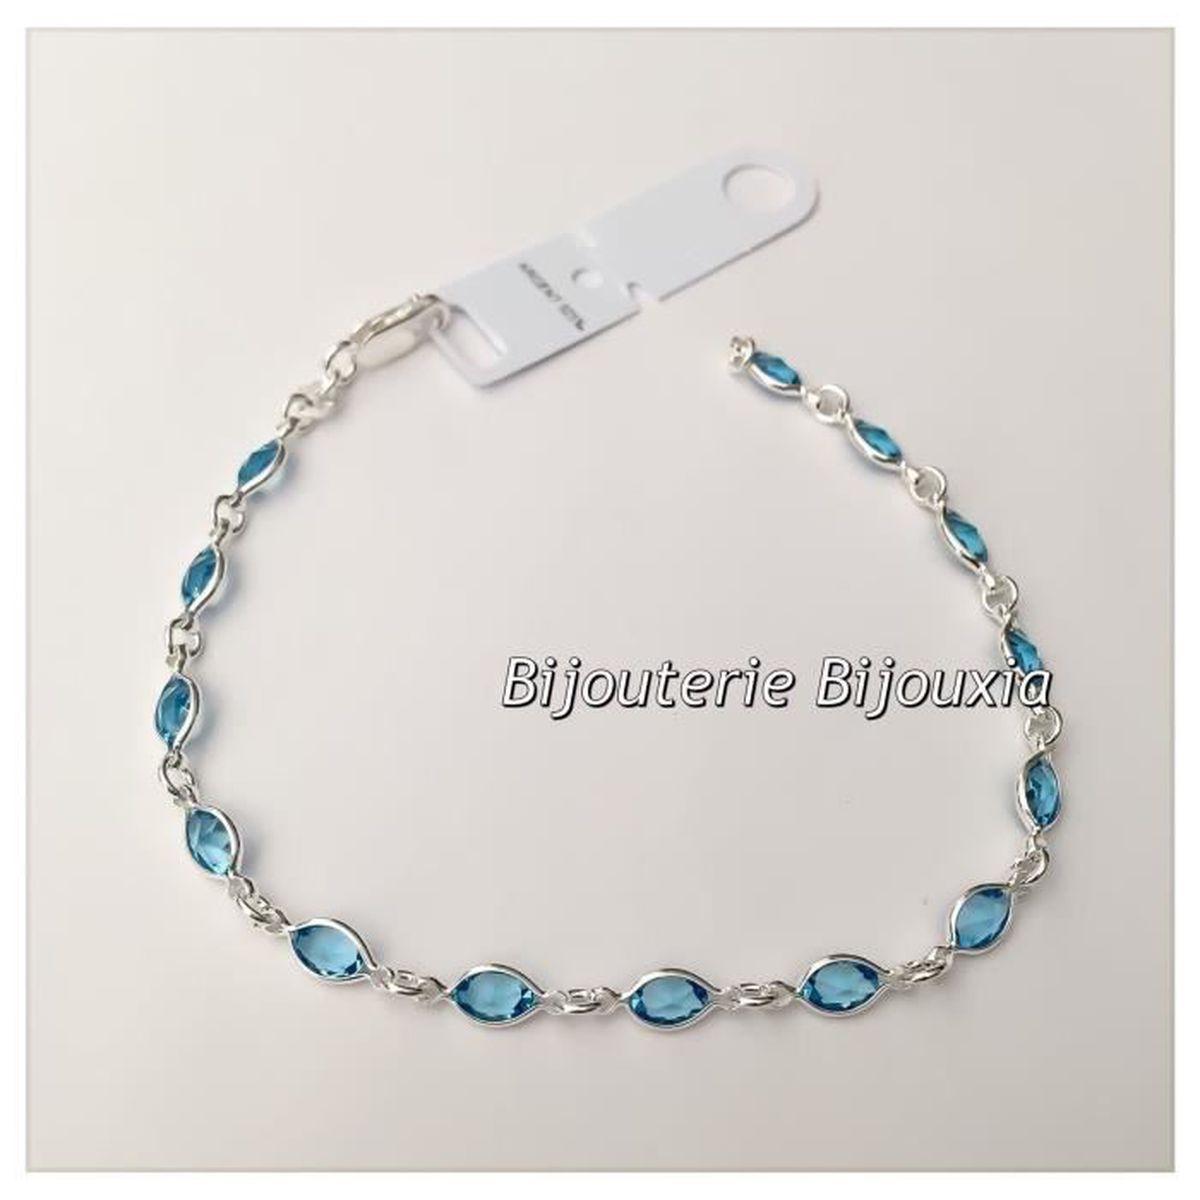 bracelet cristal aigue marine oz argent 925 1000 bijoux femme argent massif 925 1000 achat. Black Bedroom Furniture Sets. Home Design Ideas